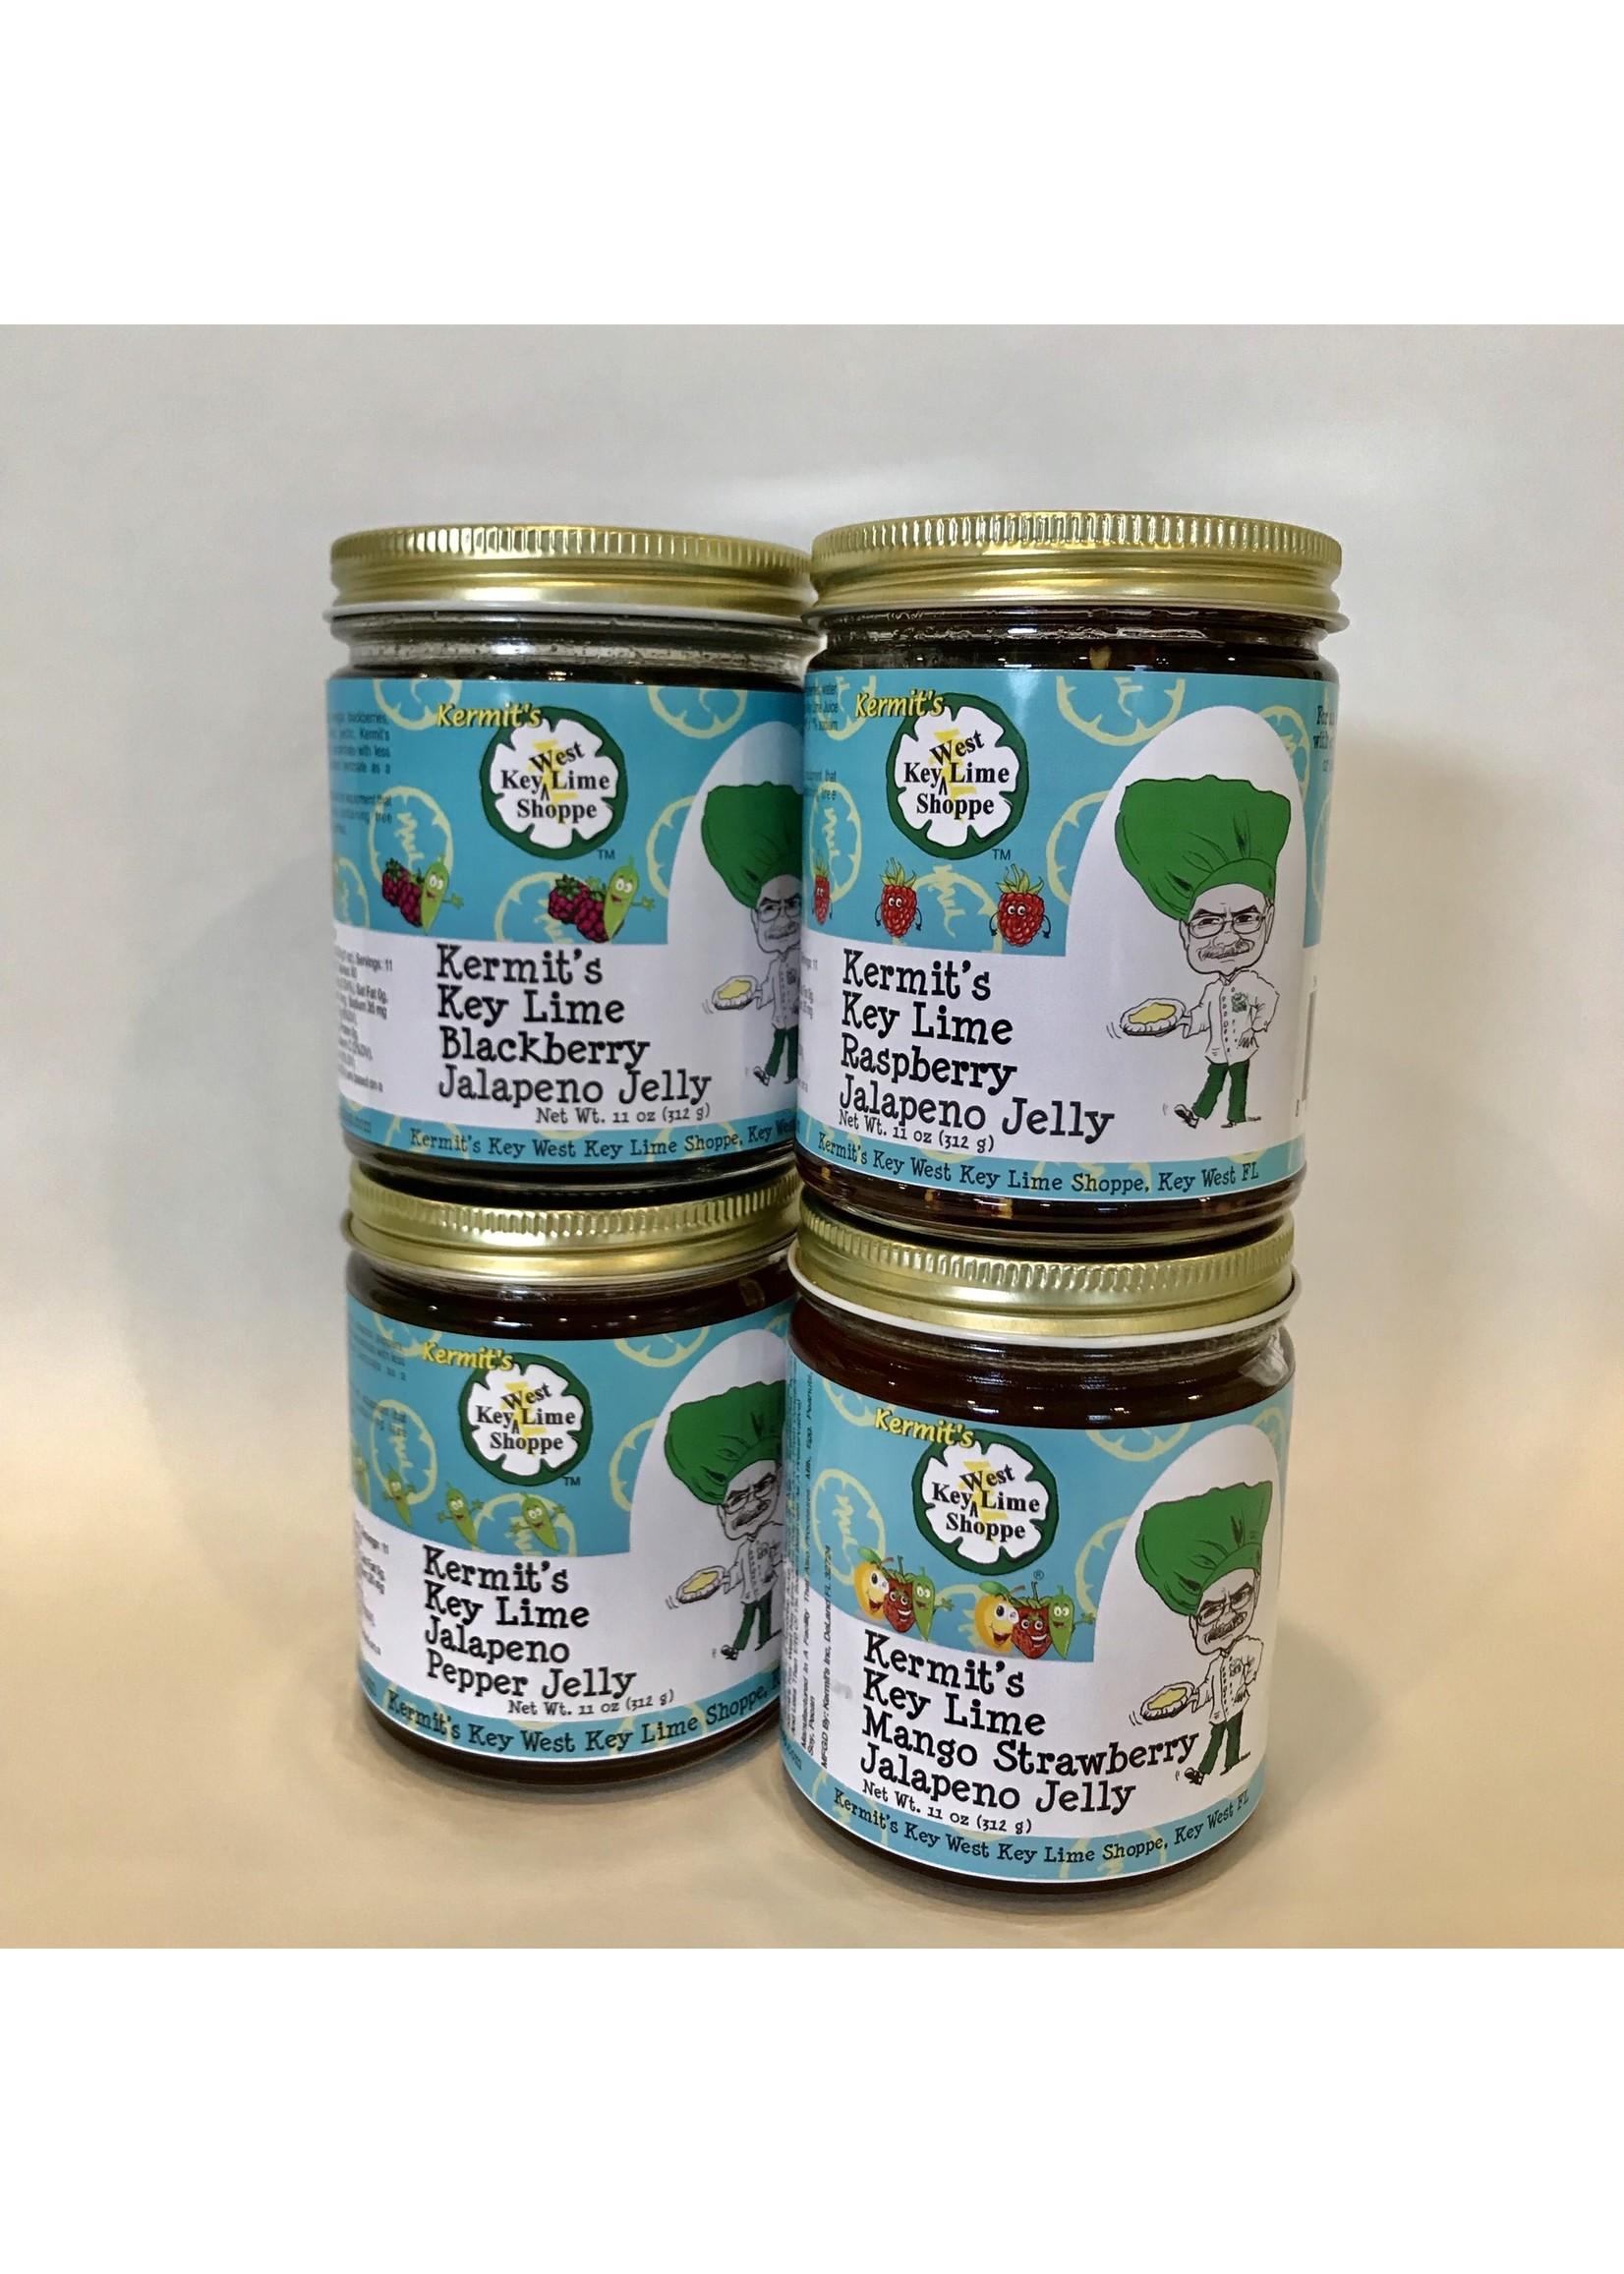 Kermit's Key Lime Jalapeno Pepper Jelly 11oz